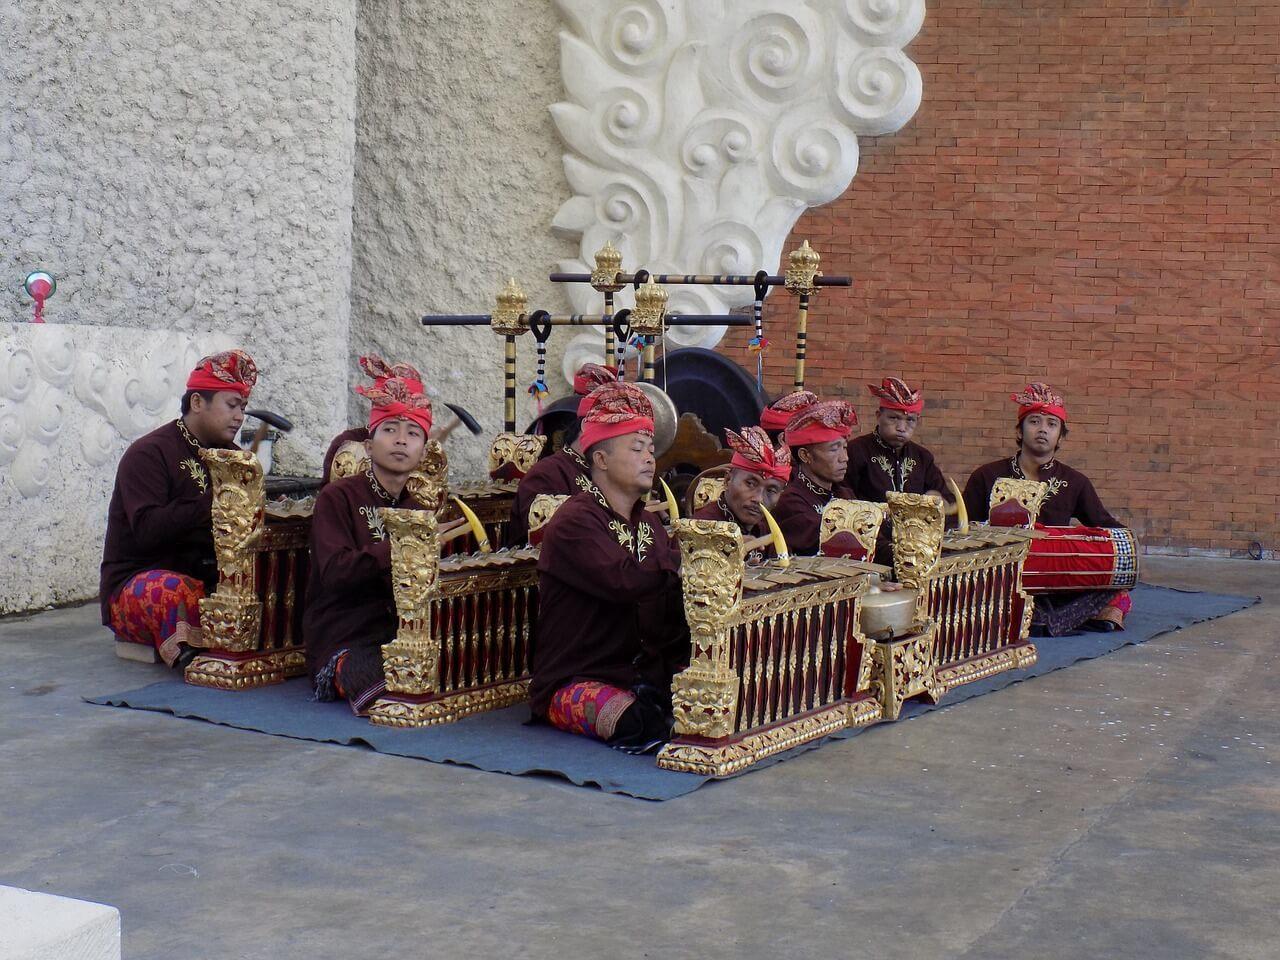 Catch a Balinese gamelan performance